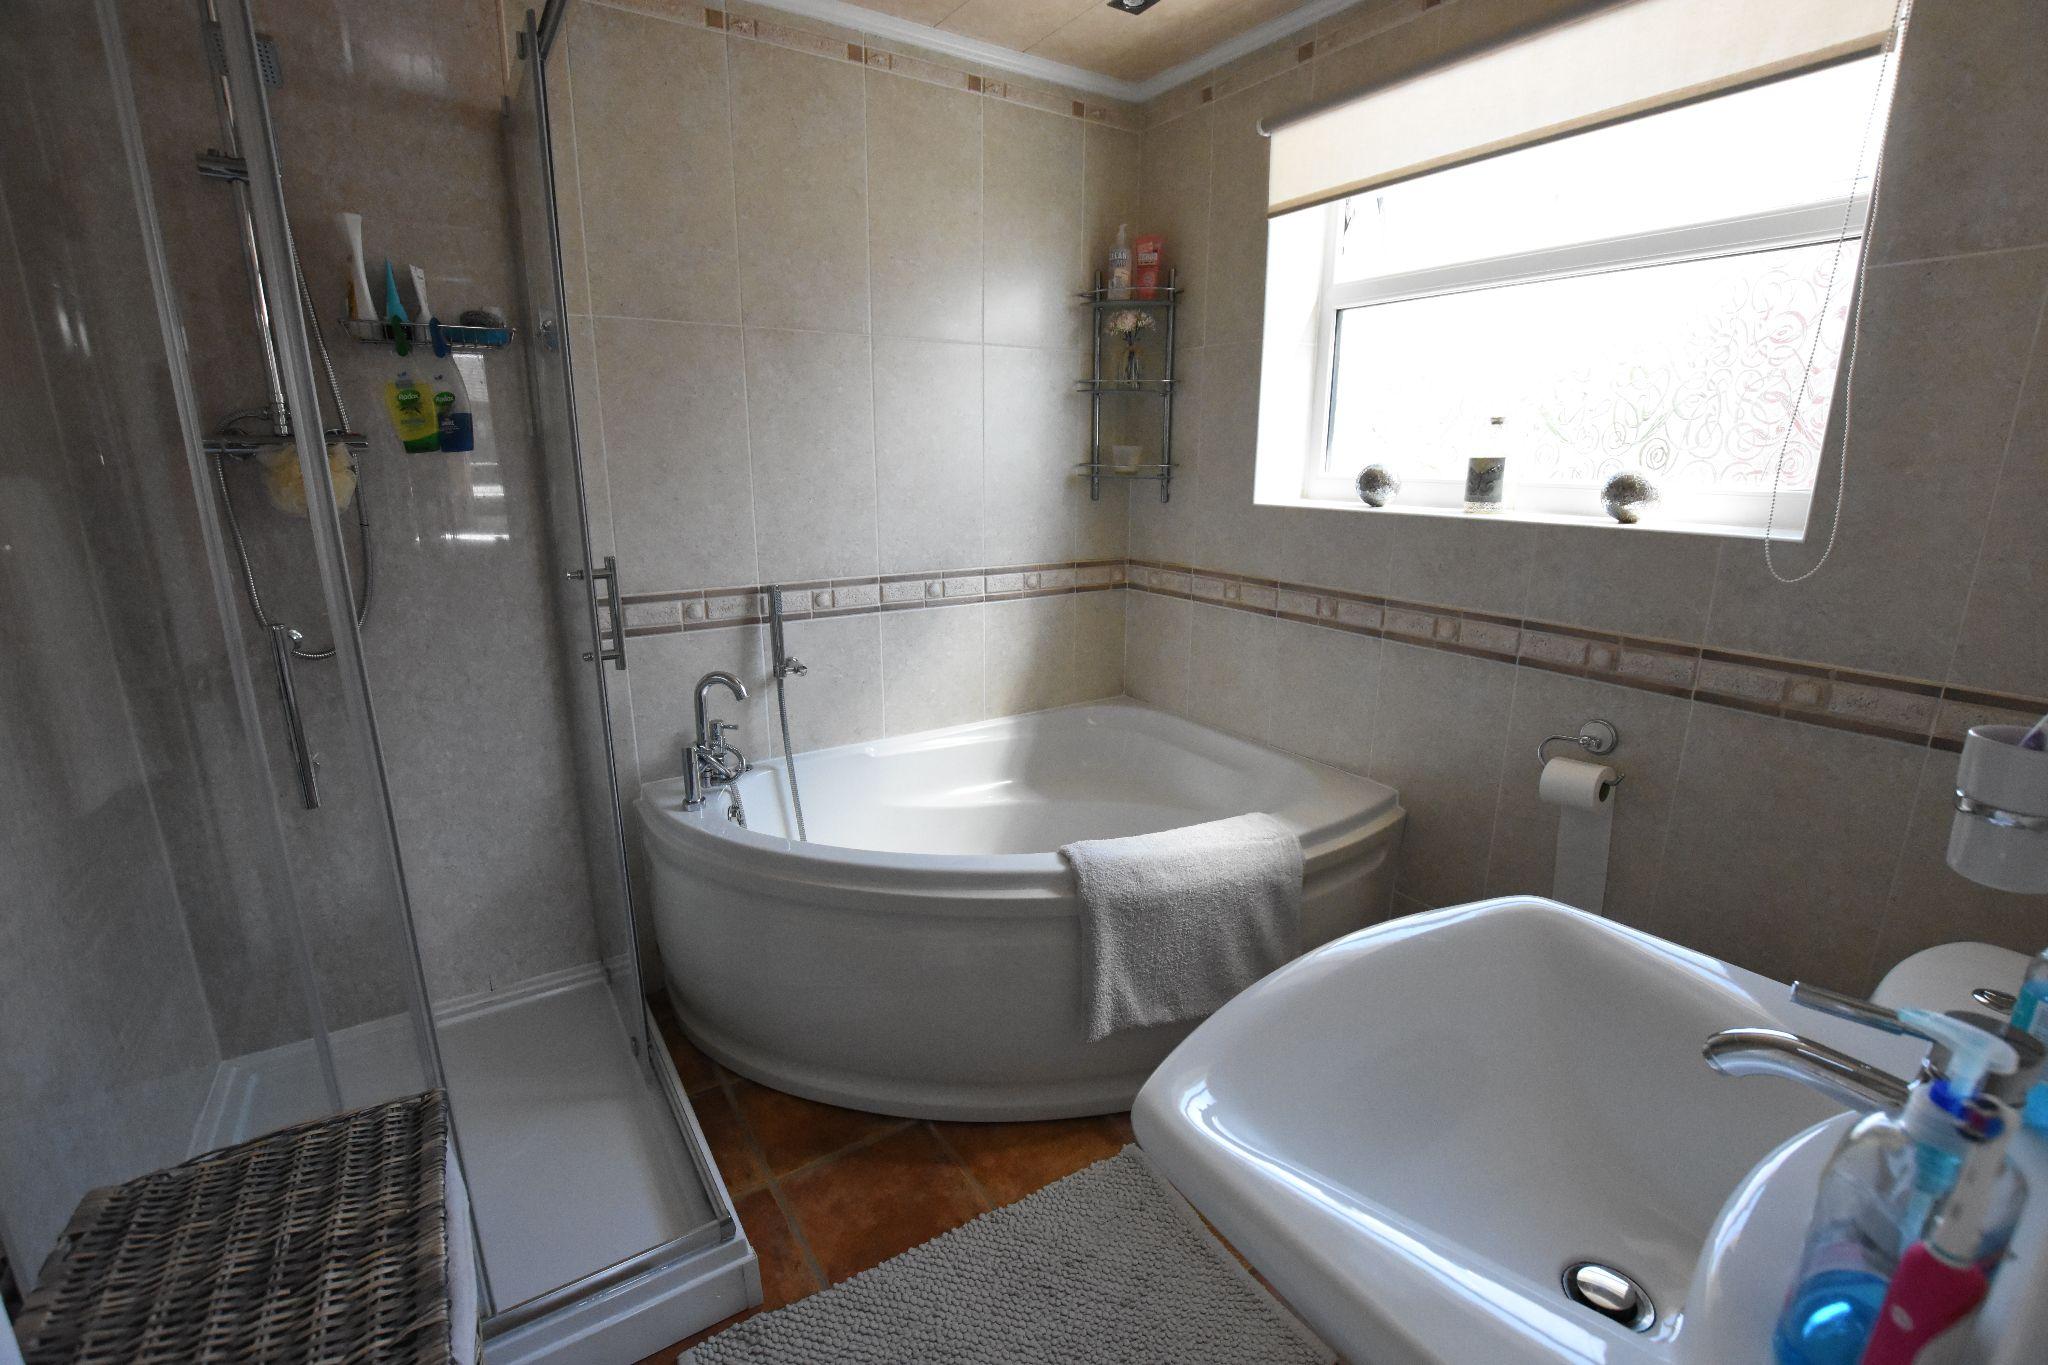 3 bedroom semi-detached house Sold STC in Preston - Bathroom